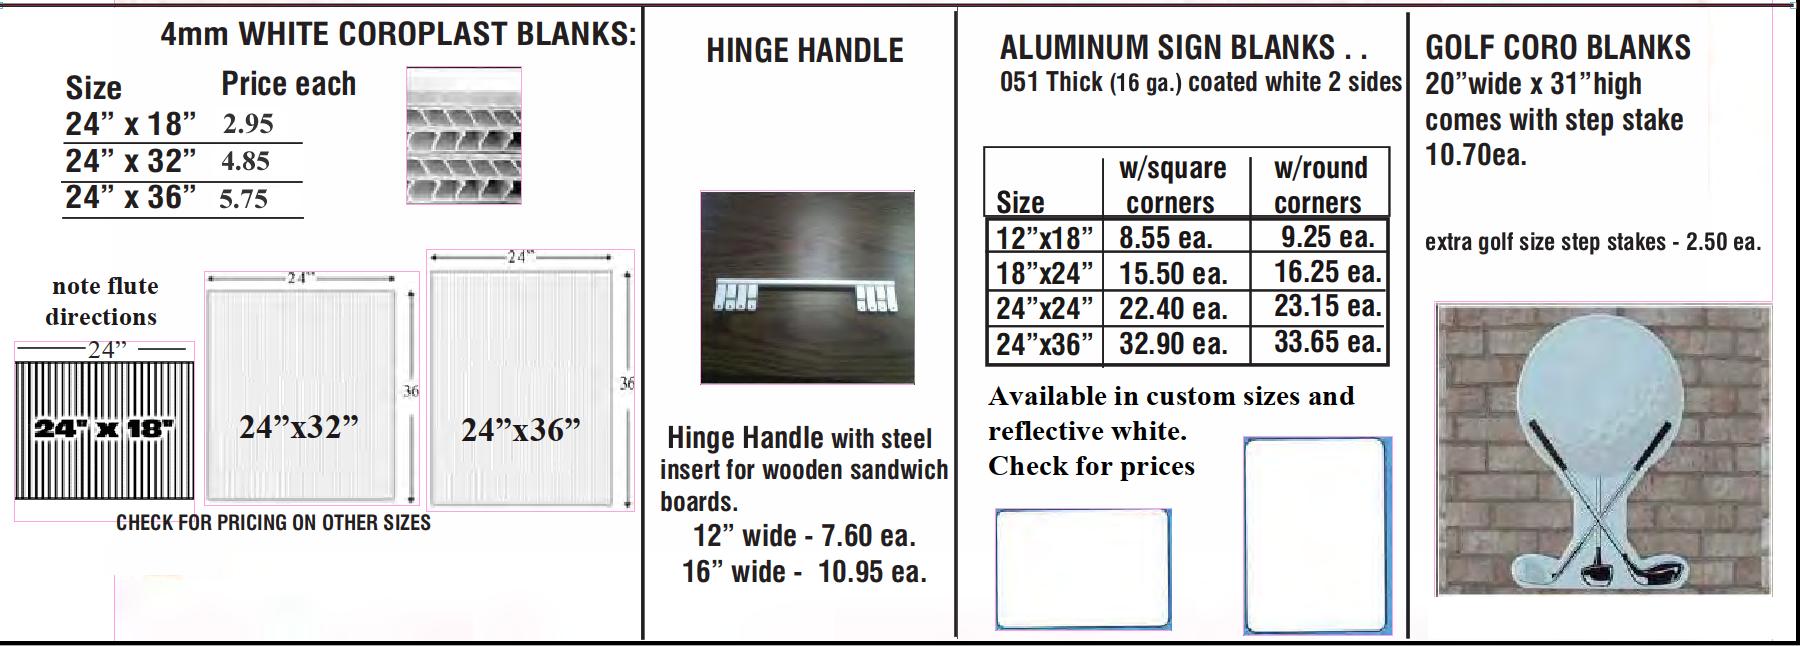 "Sign Blanks hinge hdle. step stakes Apr. 21 - Sign Blanks -  ""Coroplast"" -  Hinge Handle  - Aluminum Blanks"